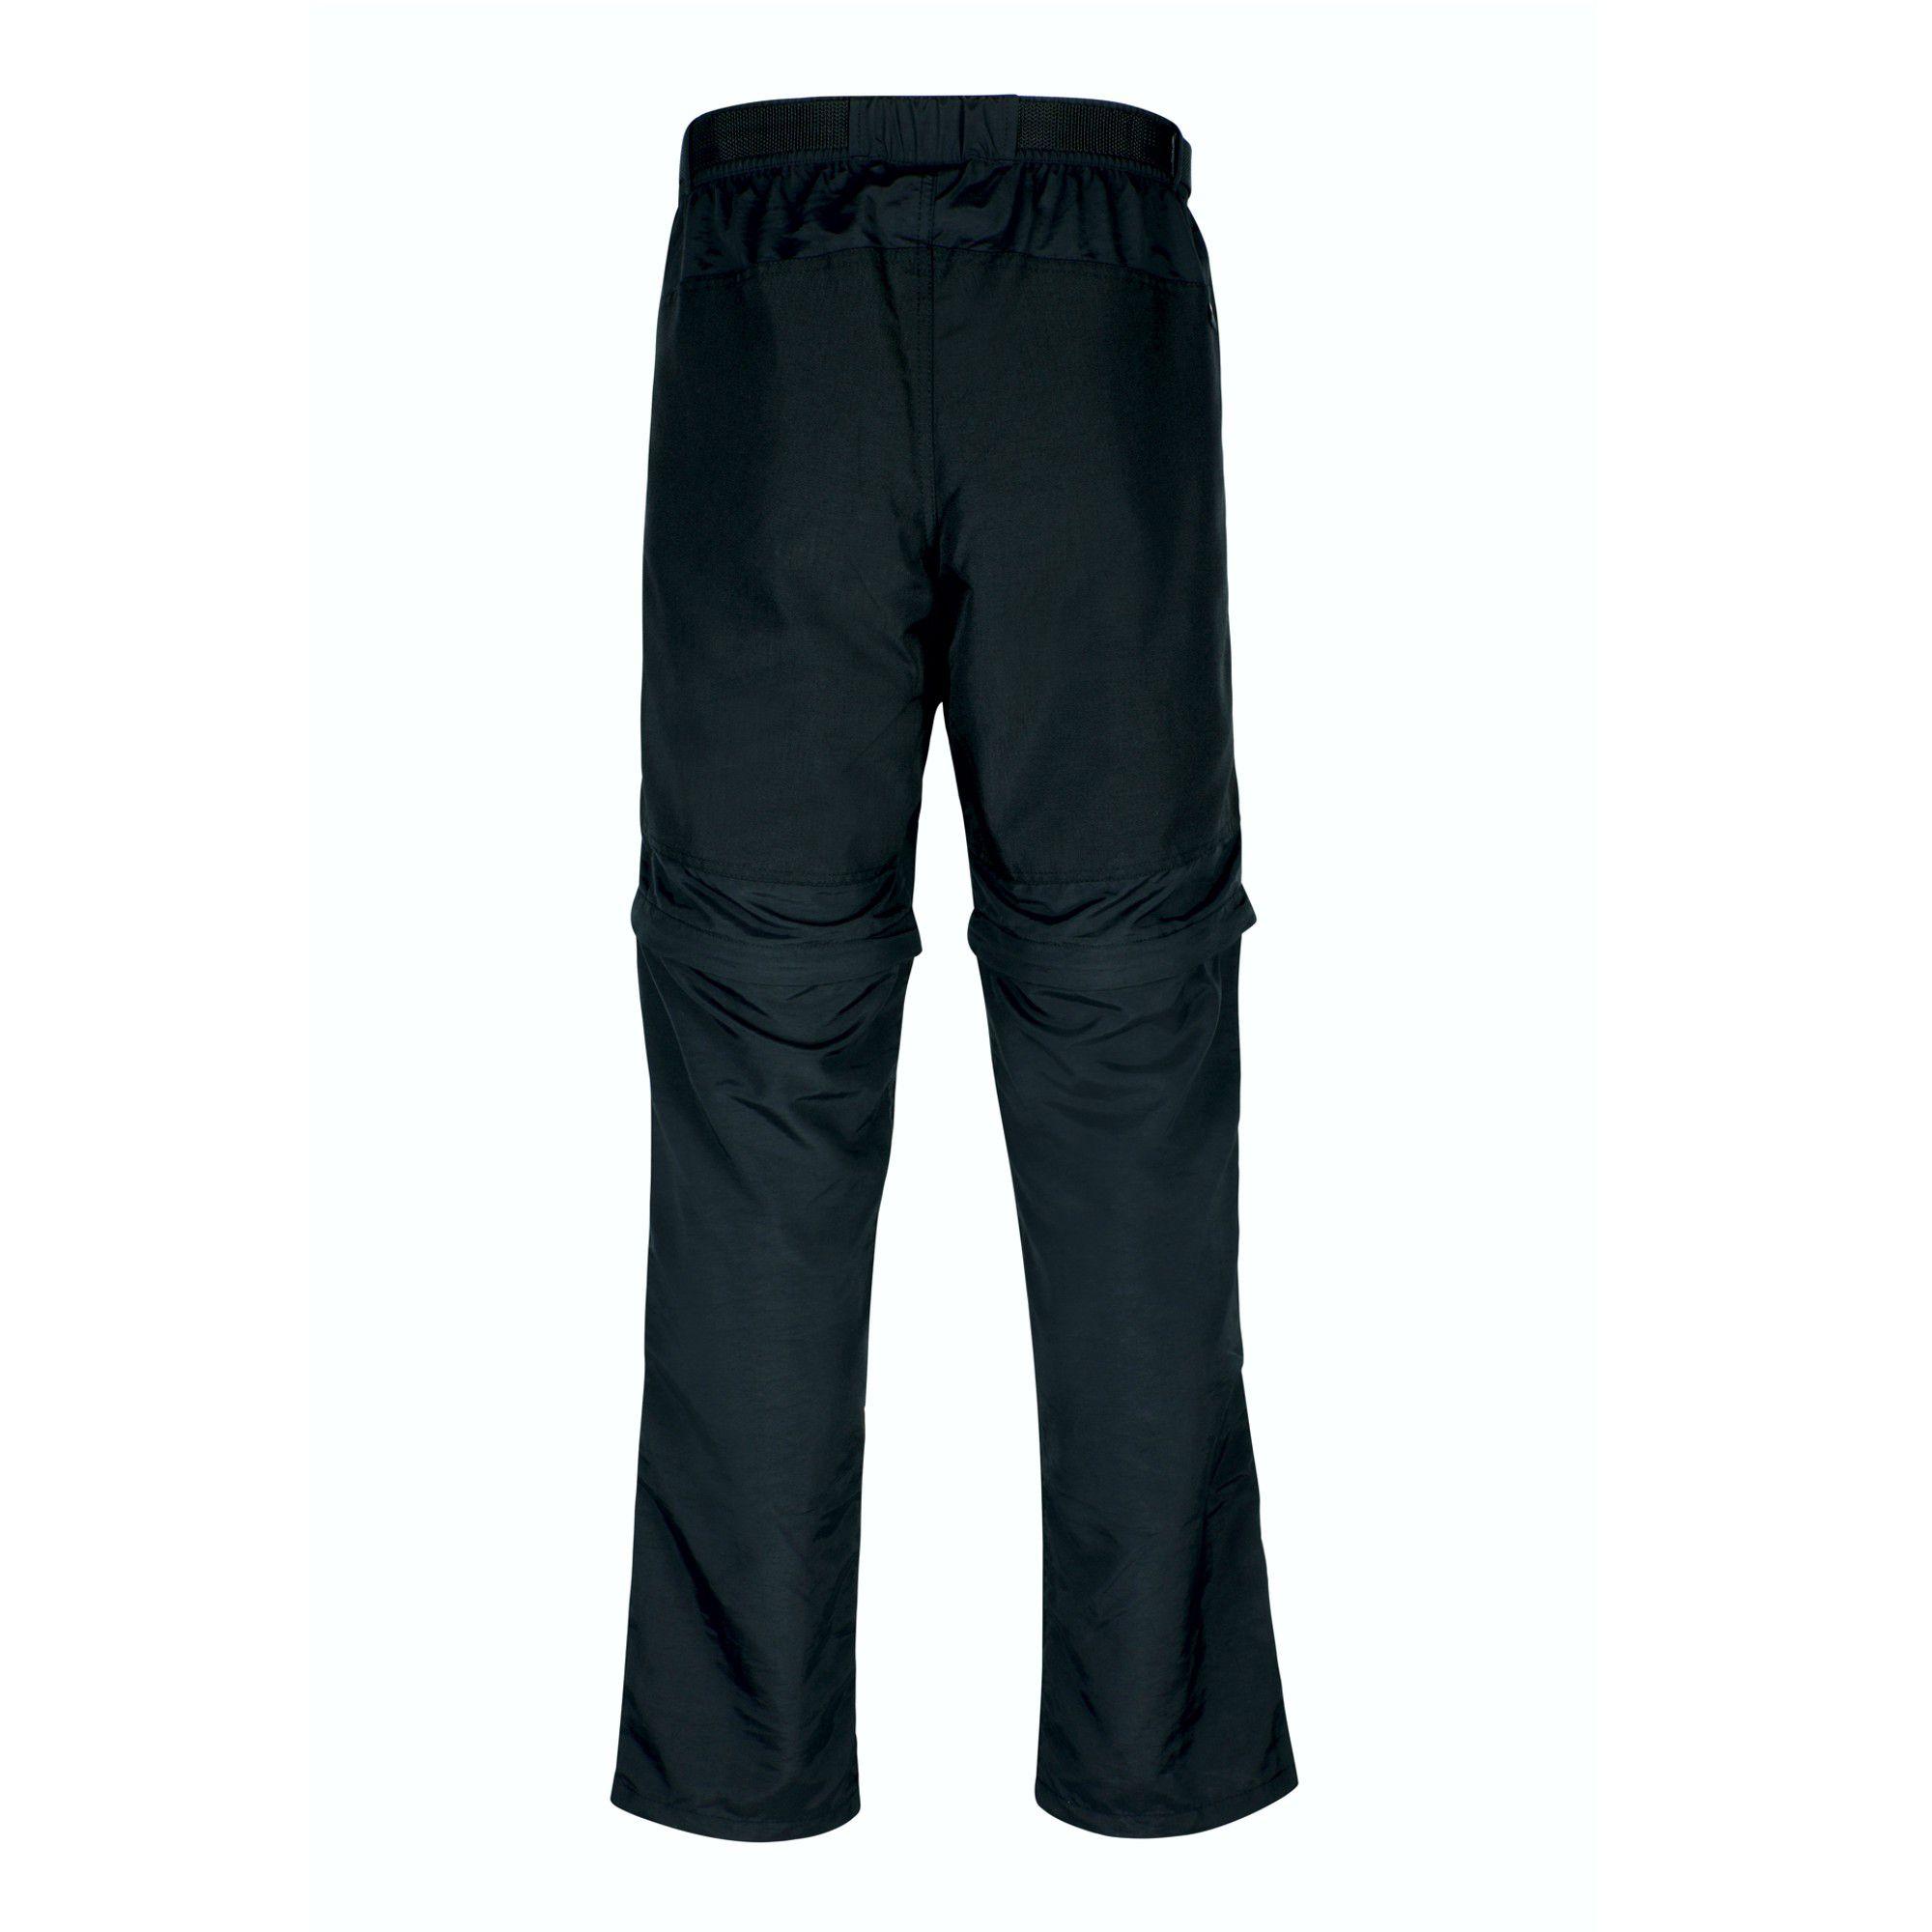 Calça-Bermuda Masculina reforçada com Cordura Hard Pro Mountain - Preta